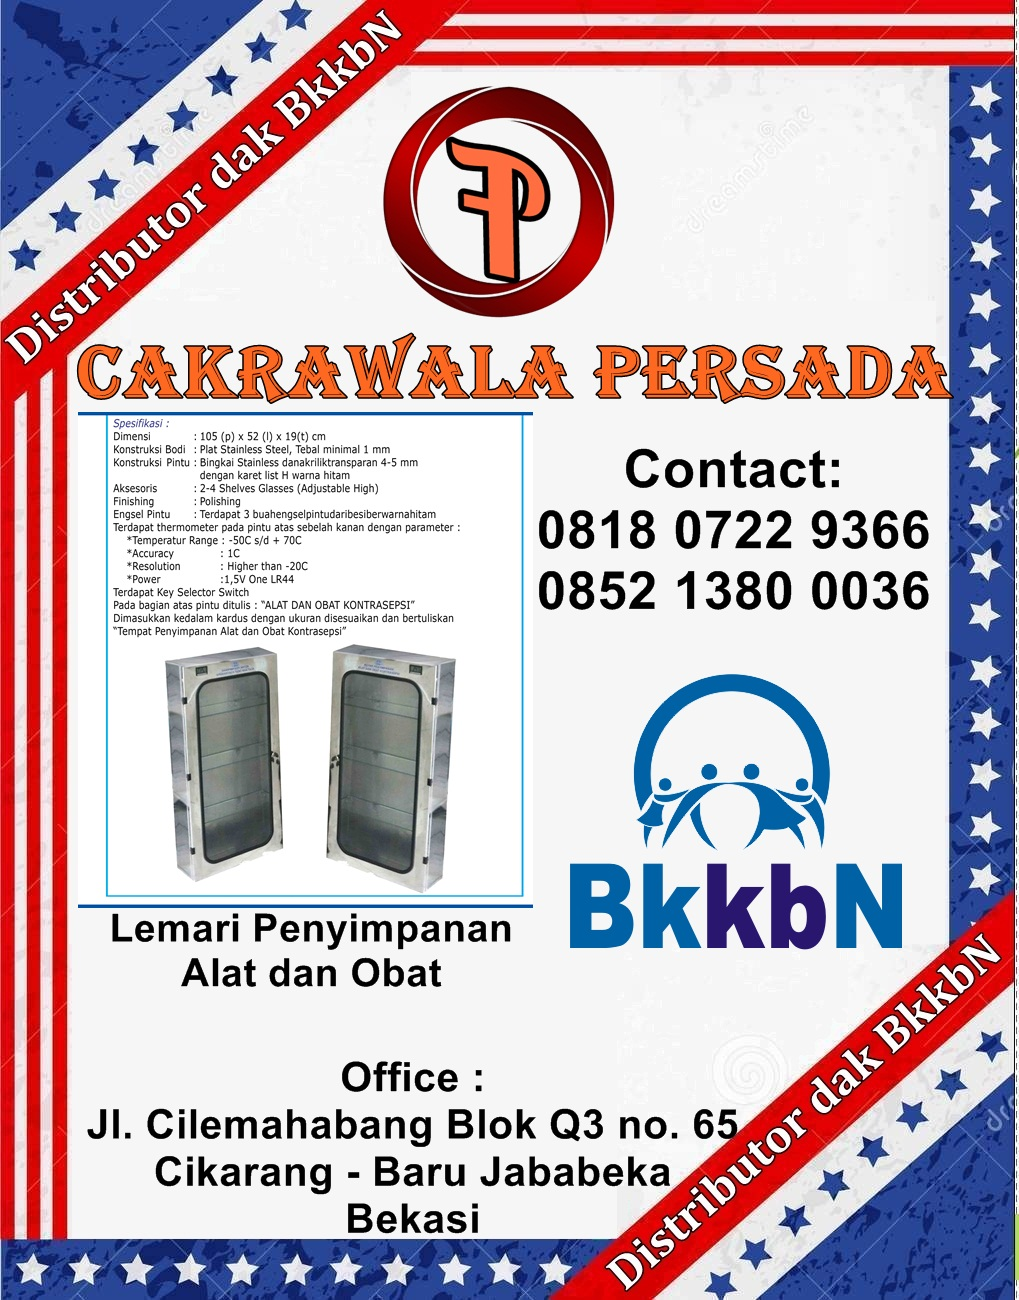 distributor produk dak bkkbn, produsen produk dak bkkbn, distributor dak bkkbn, produsen dak bkkbn, adyatama indonesia, supplier dak bkkbn, produk dak bkkbn 2017, keluarga berencana, lpse, sarana plkb, ppkbd, genre kit, obgyn bed, kie kit, iud kit, implant removal kit, media advokasi, pengadaan dak bkkbn, lemari alkon, lemari obat dan kontrasepsi, alat kesehatan, cakrawala persada, cv. cakrawala persada, Produsen dan distributor dak bkkbn, distributor bkkbn, genre kit, implant kit, iud kit, keluarga berencana, kie kit, lemari penyimpanan obat, media advokasi, obgyn bed 2017, ppkbd/sub ppkbd, produsen bkkbn, Produsen dak bkkbn, sarana plkb, supplier dak bkkbn, pengadaan produk dak bkkbn, media advokasi 2017, obgyn bed 2017, PLKB 2017,